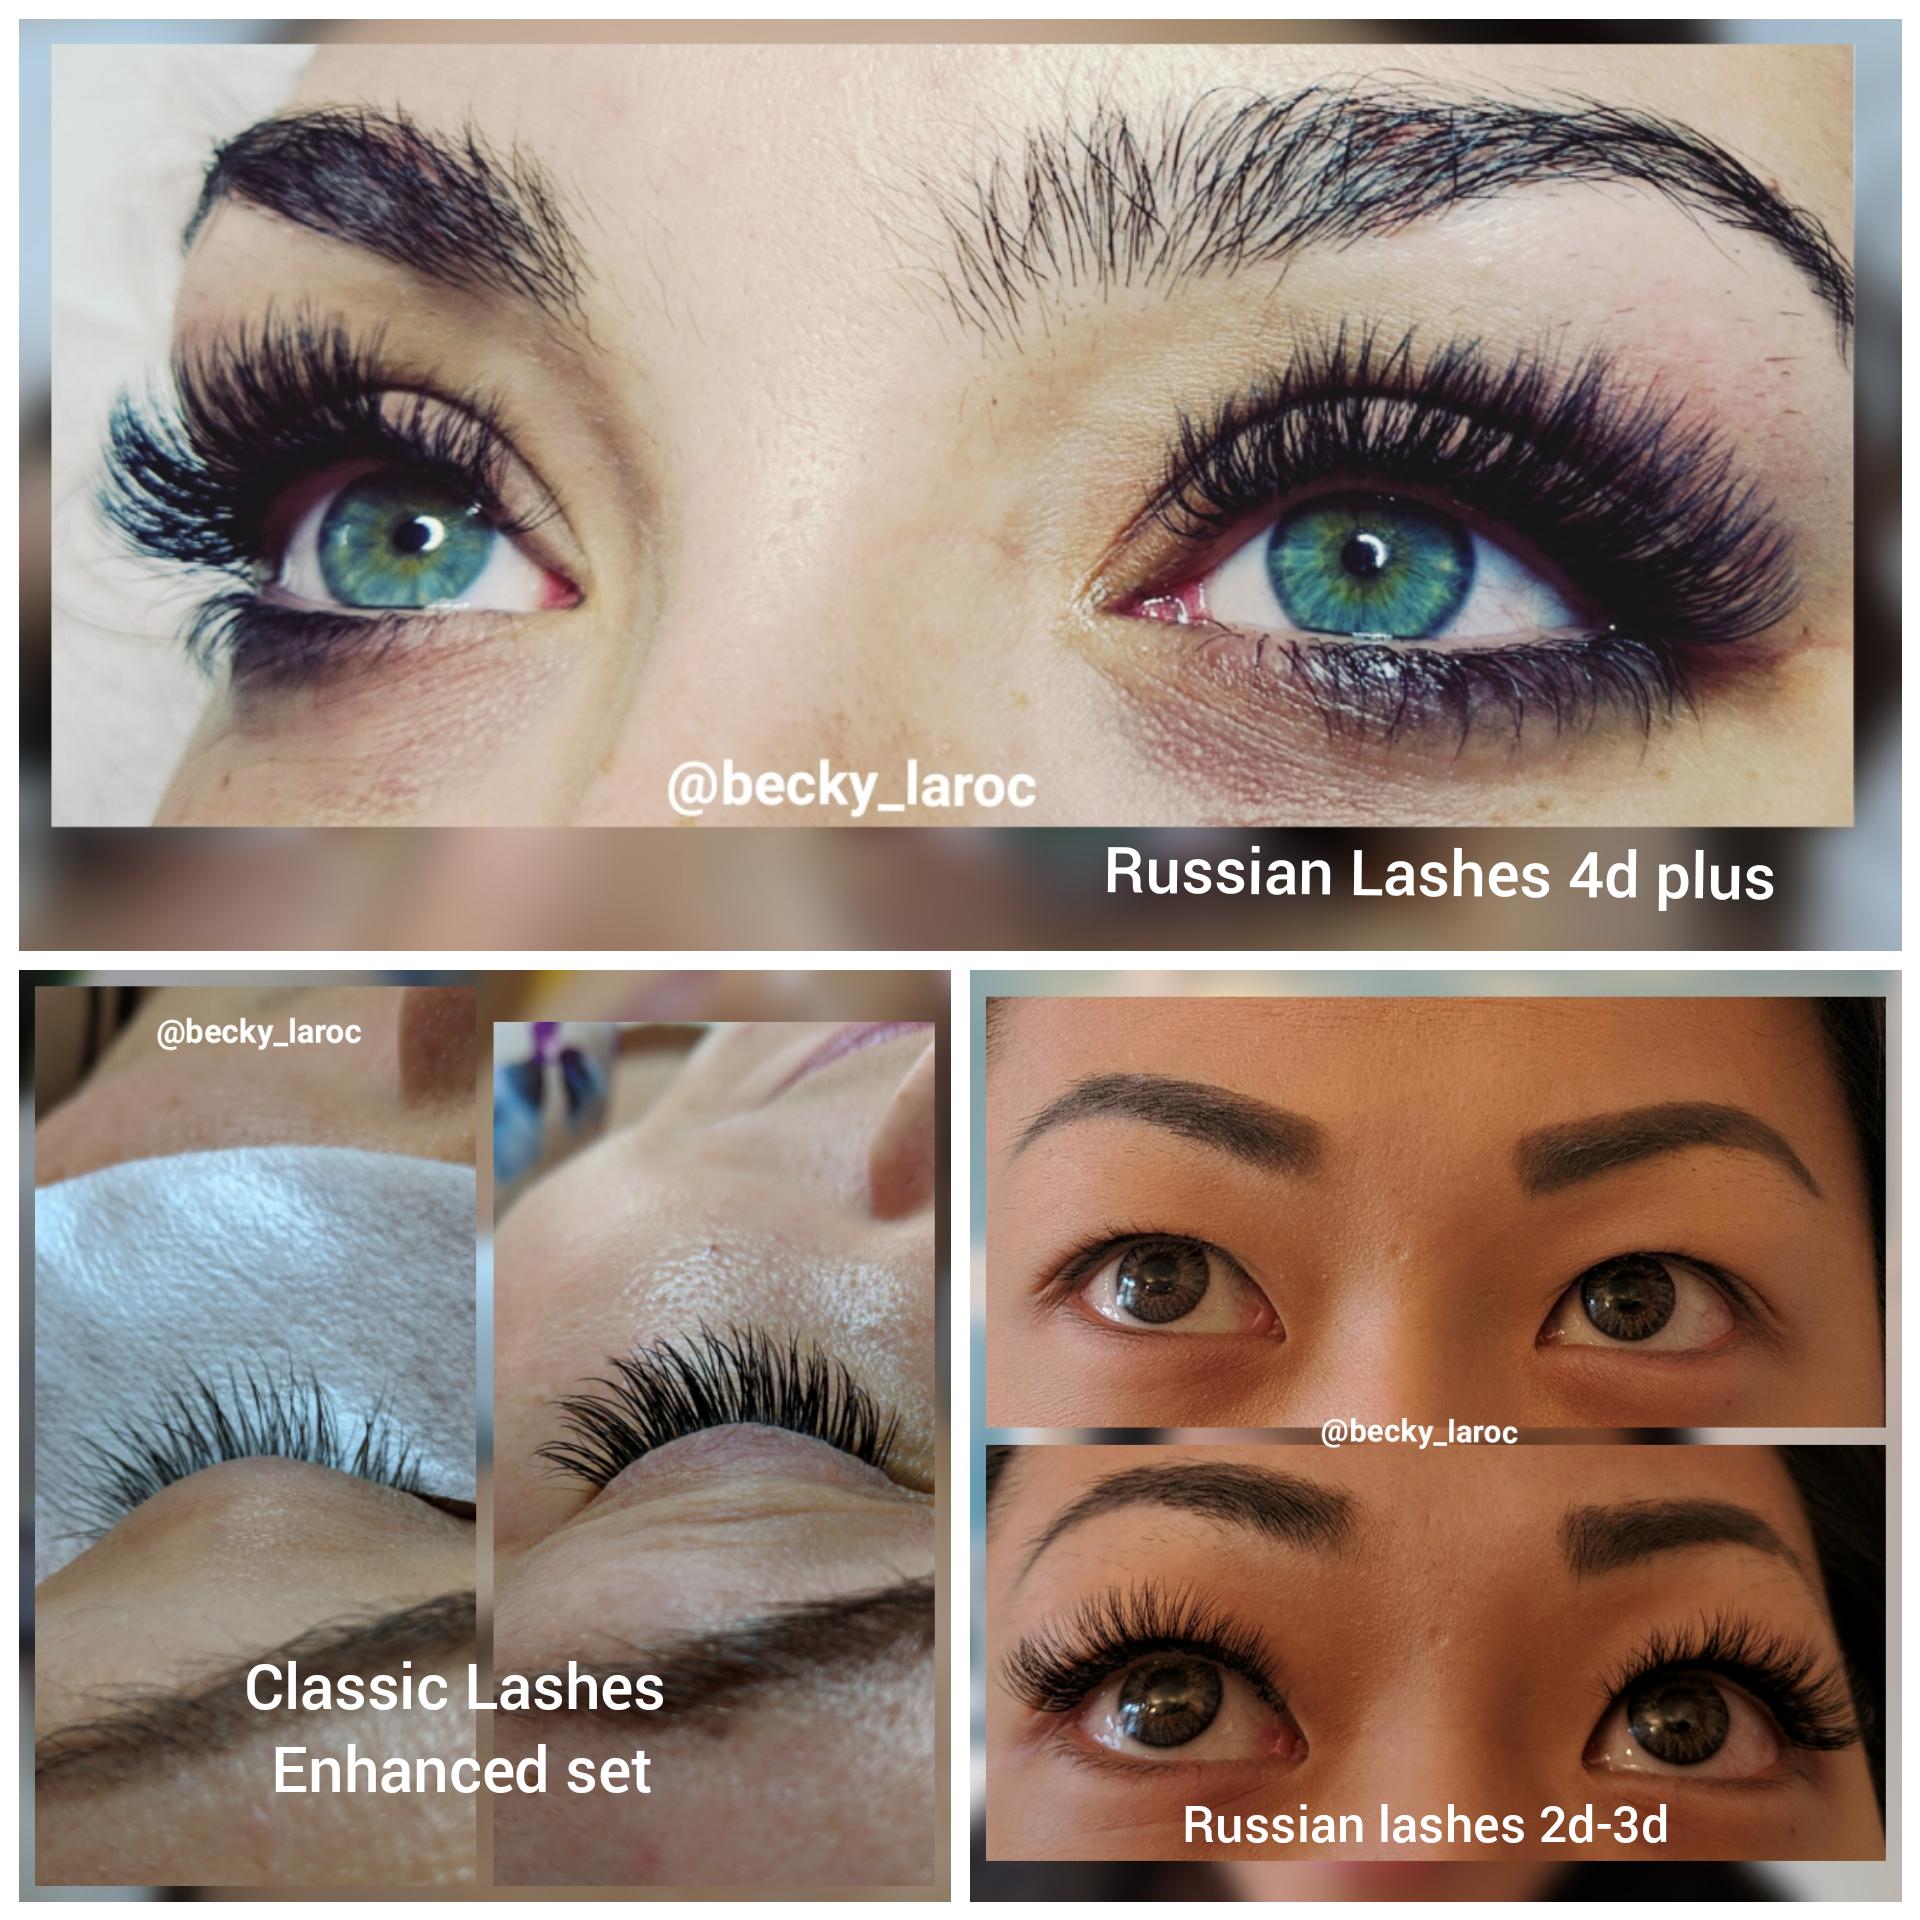 a5abadfecc5 Beautiful Semi Permanent Lashes - Becky Laroc (Beauty Specialist)